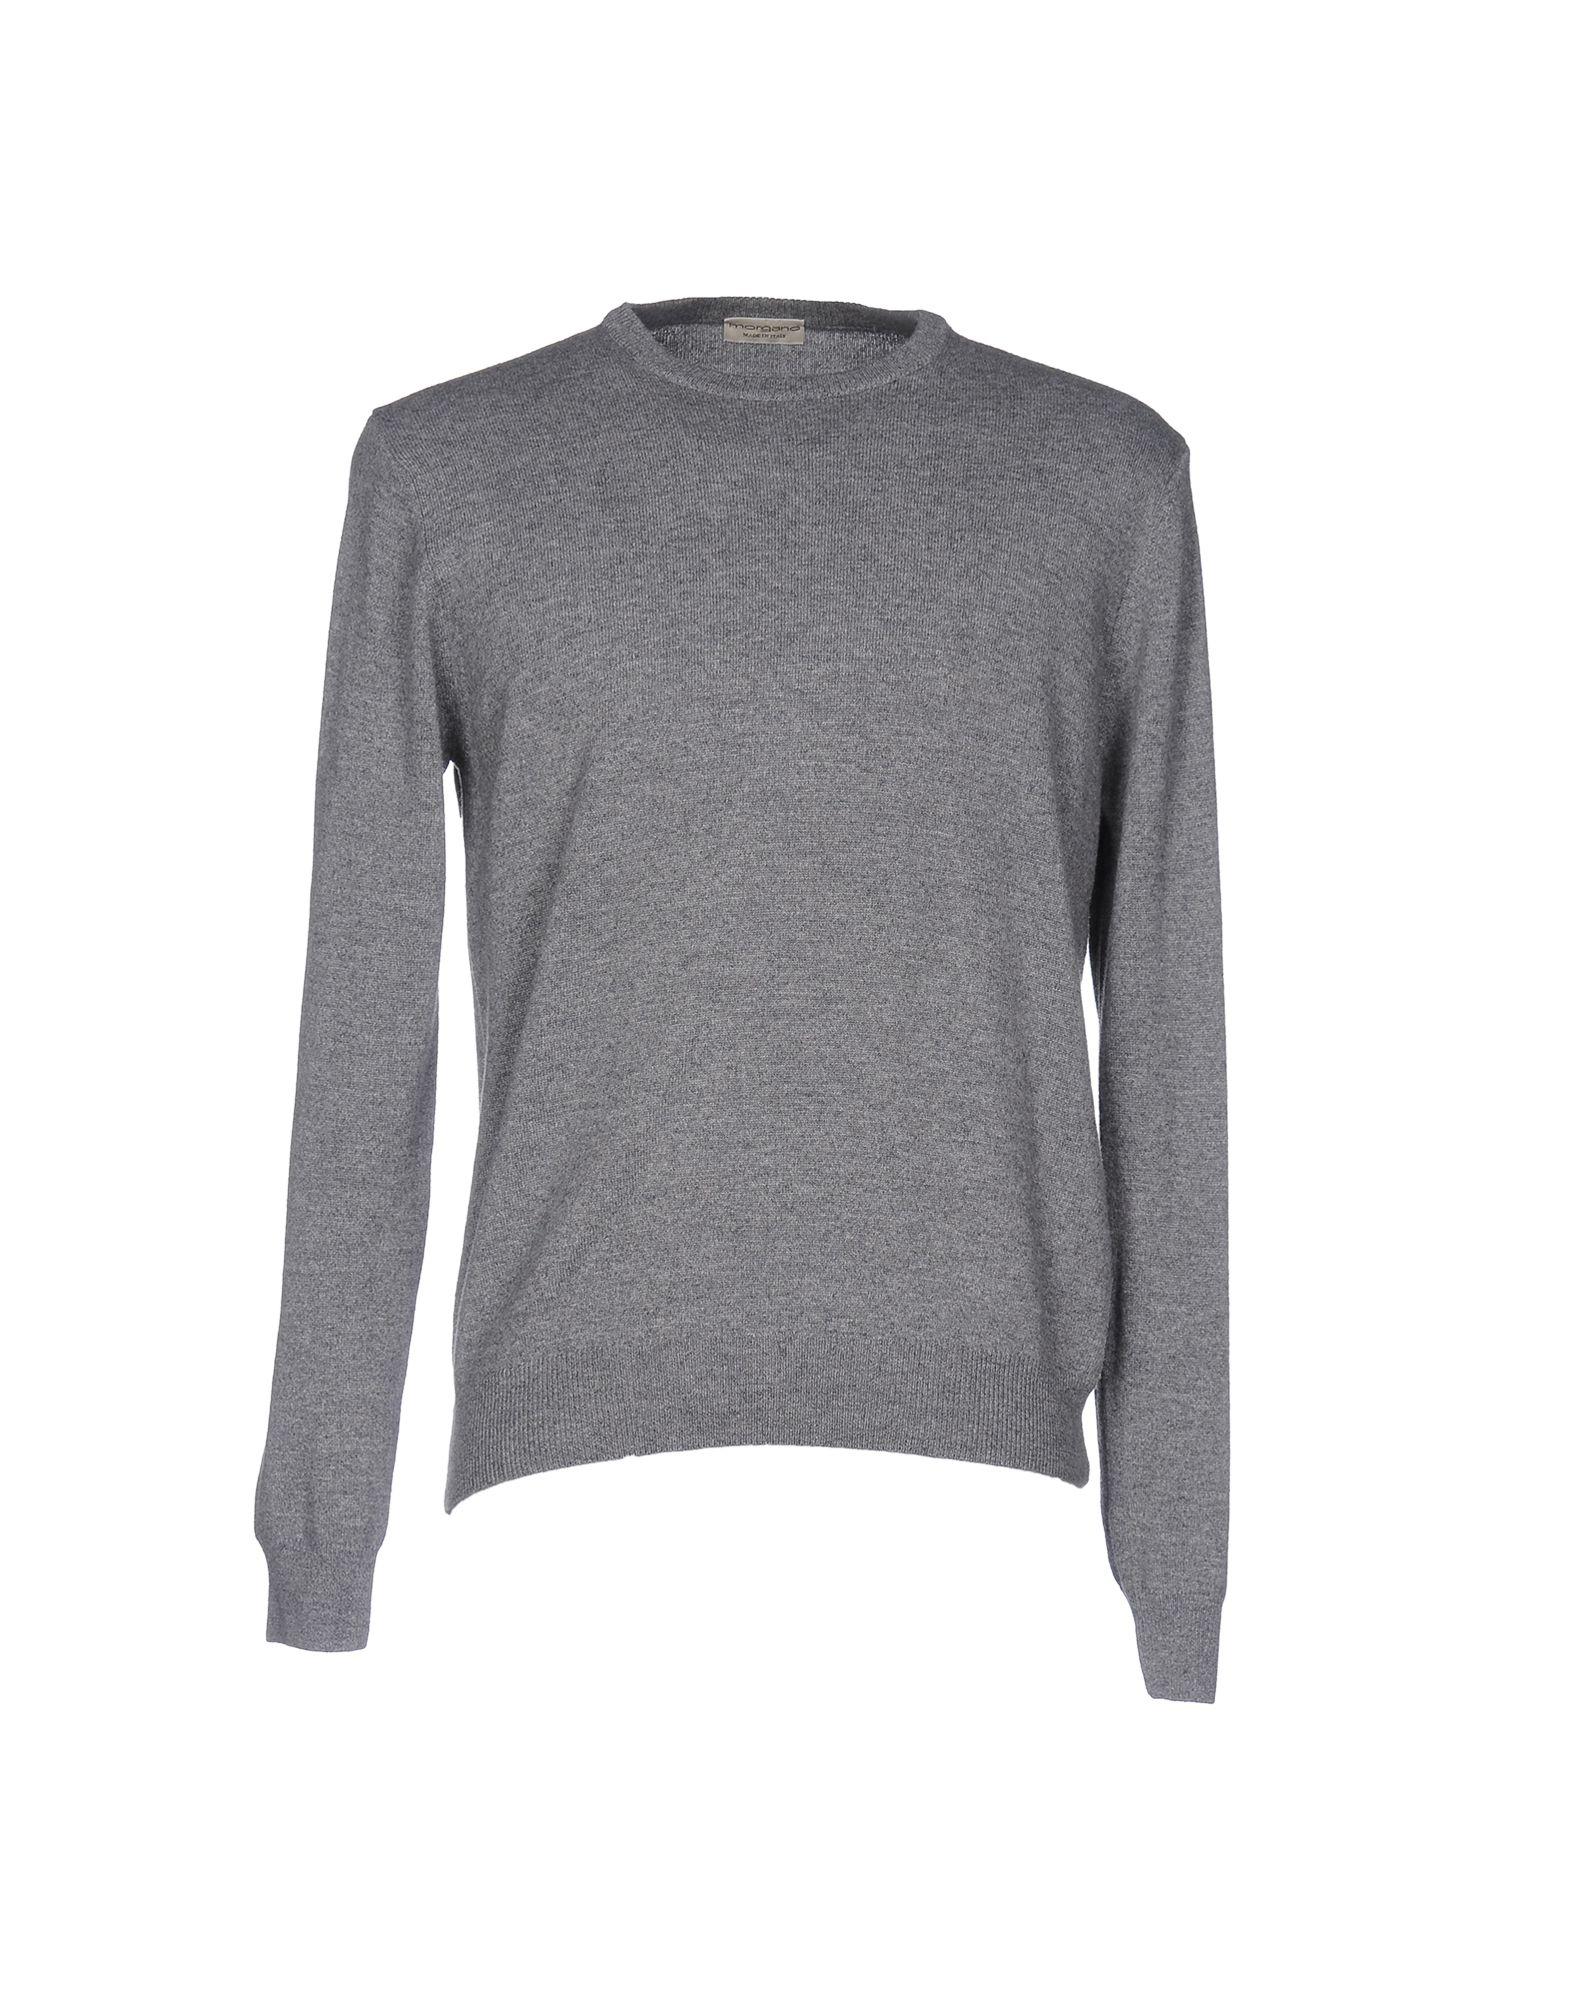 MORGANO Sweater in Grey